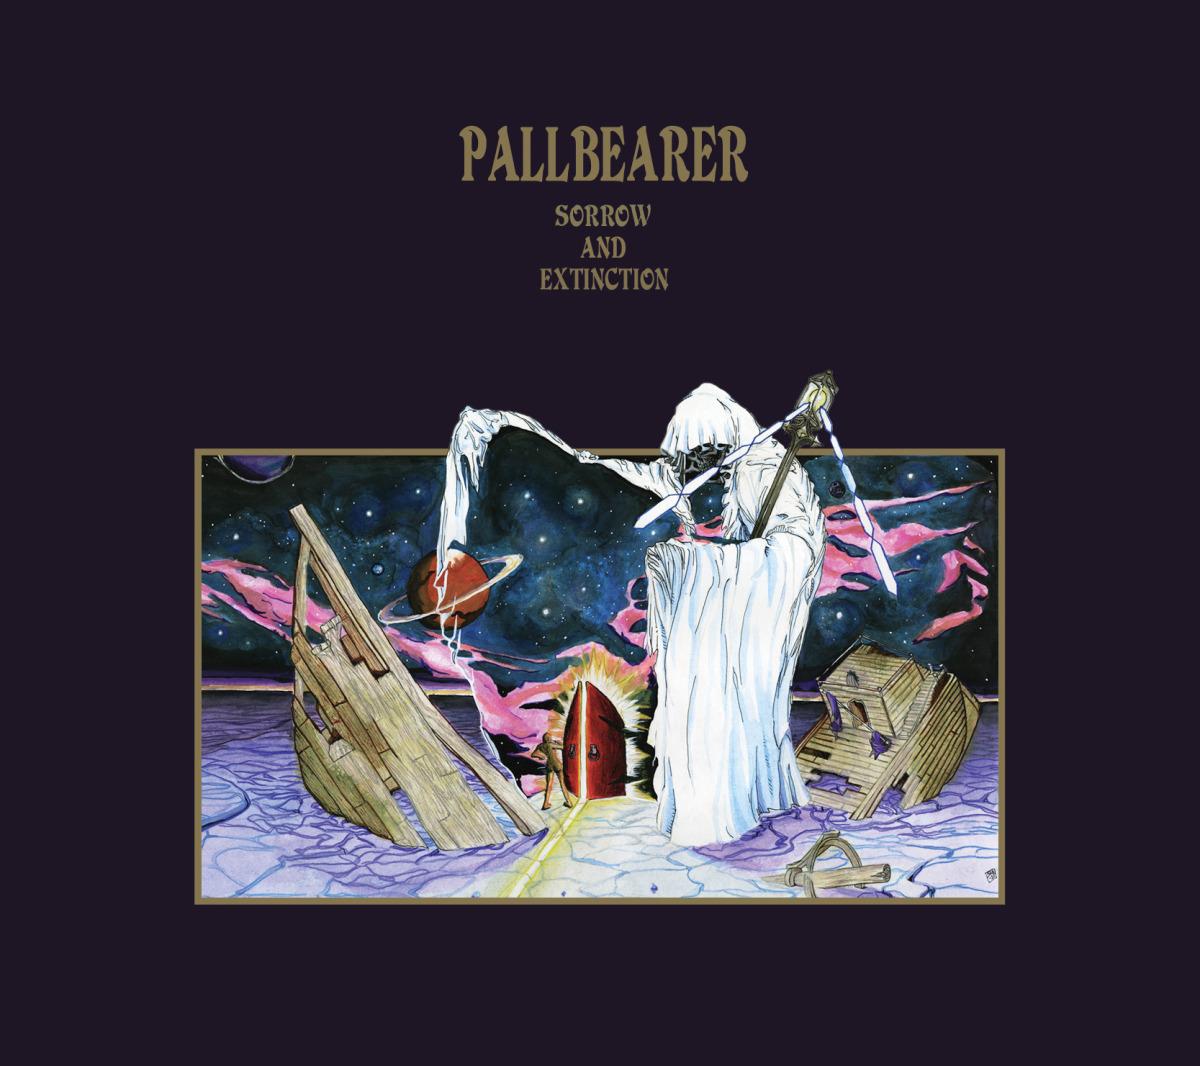 Pallbearer • Sorrow and Extinction